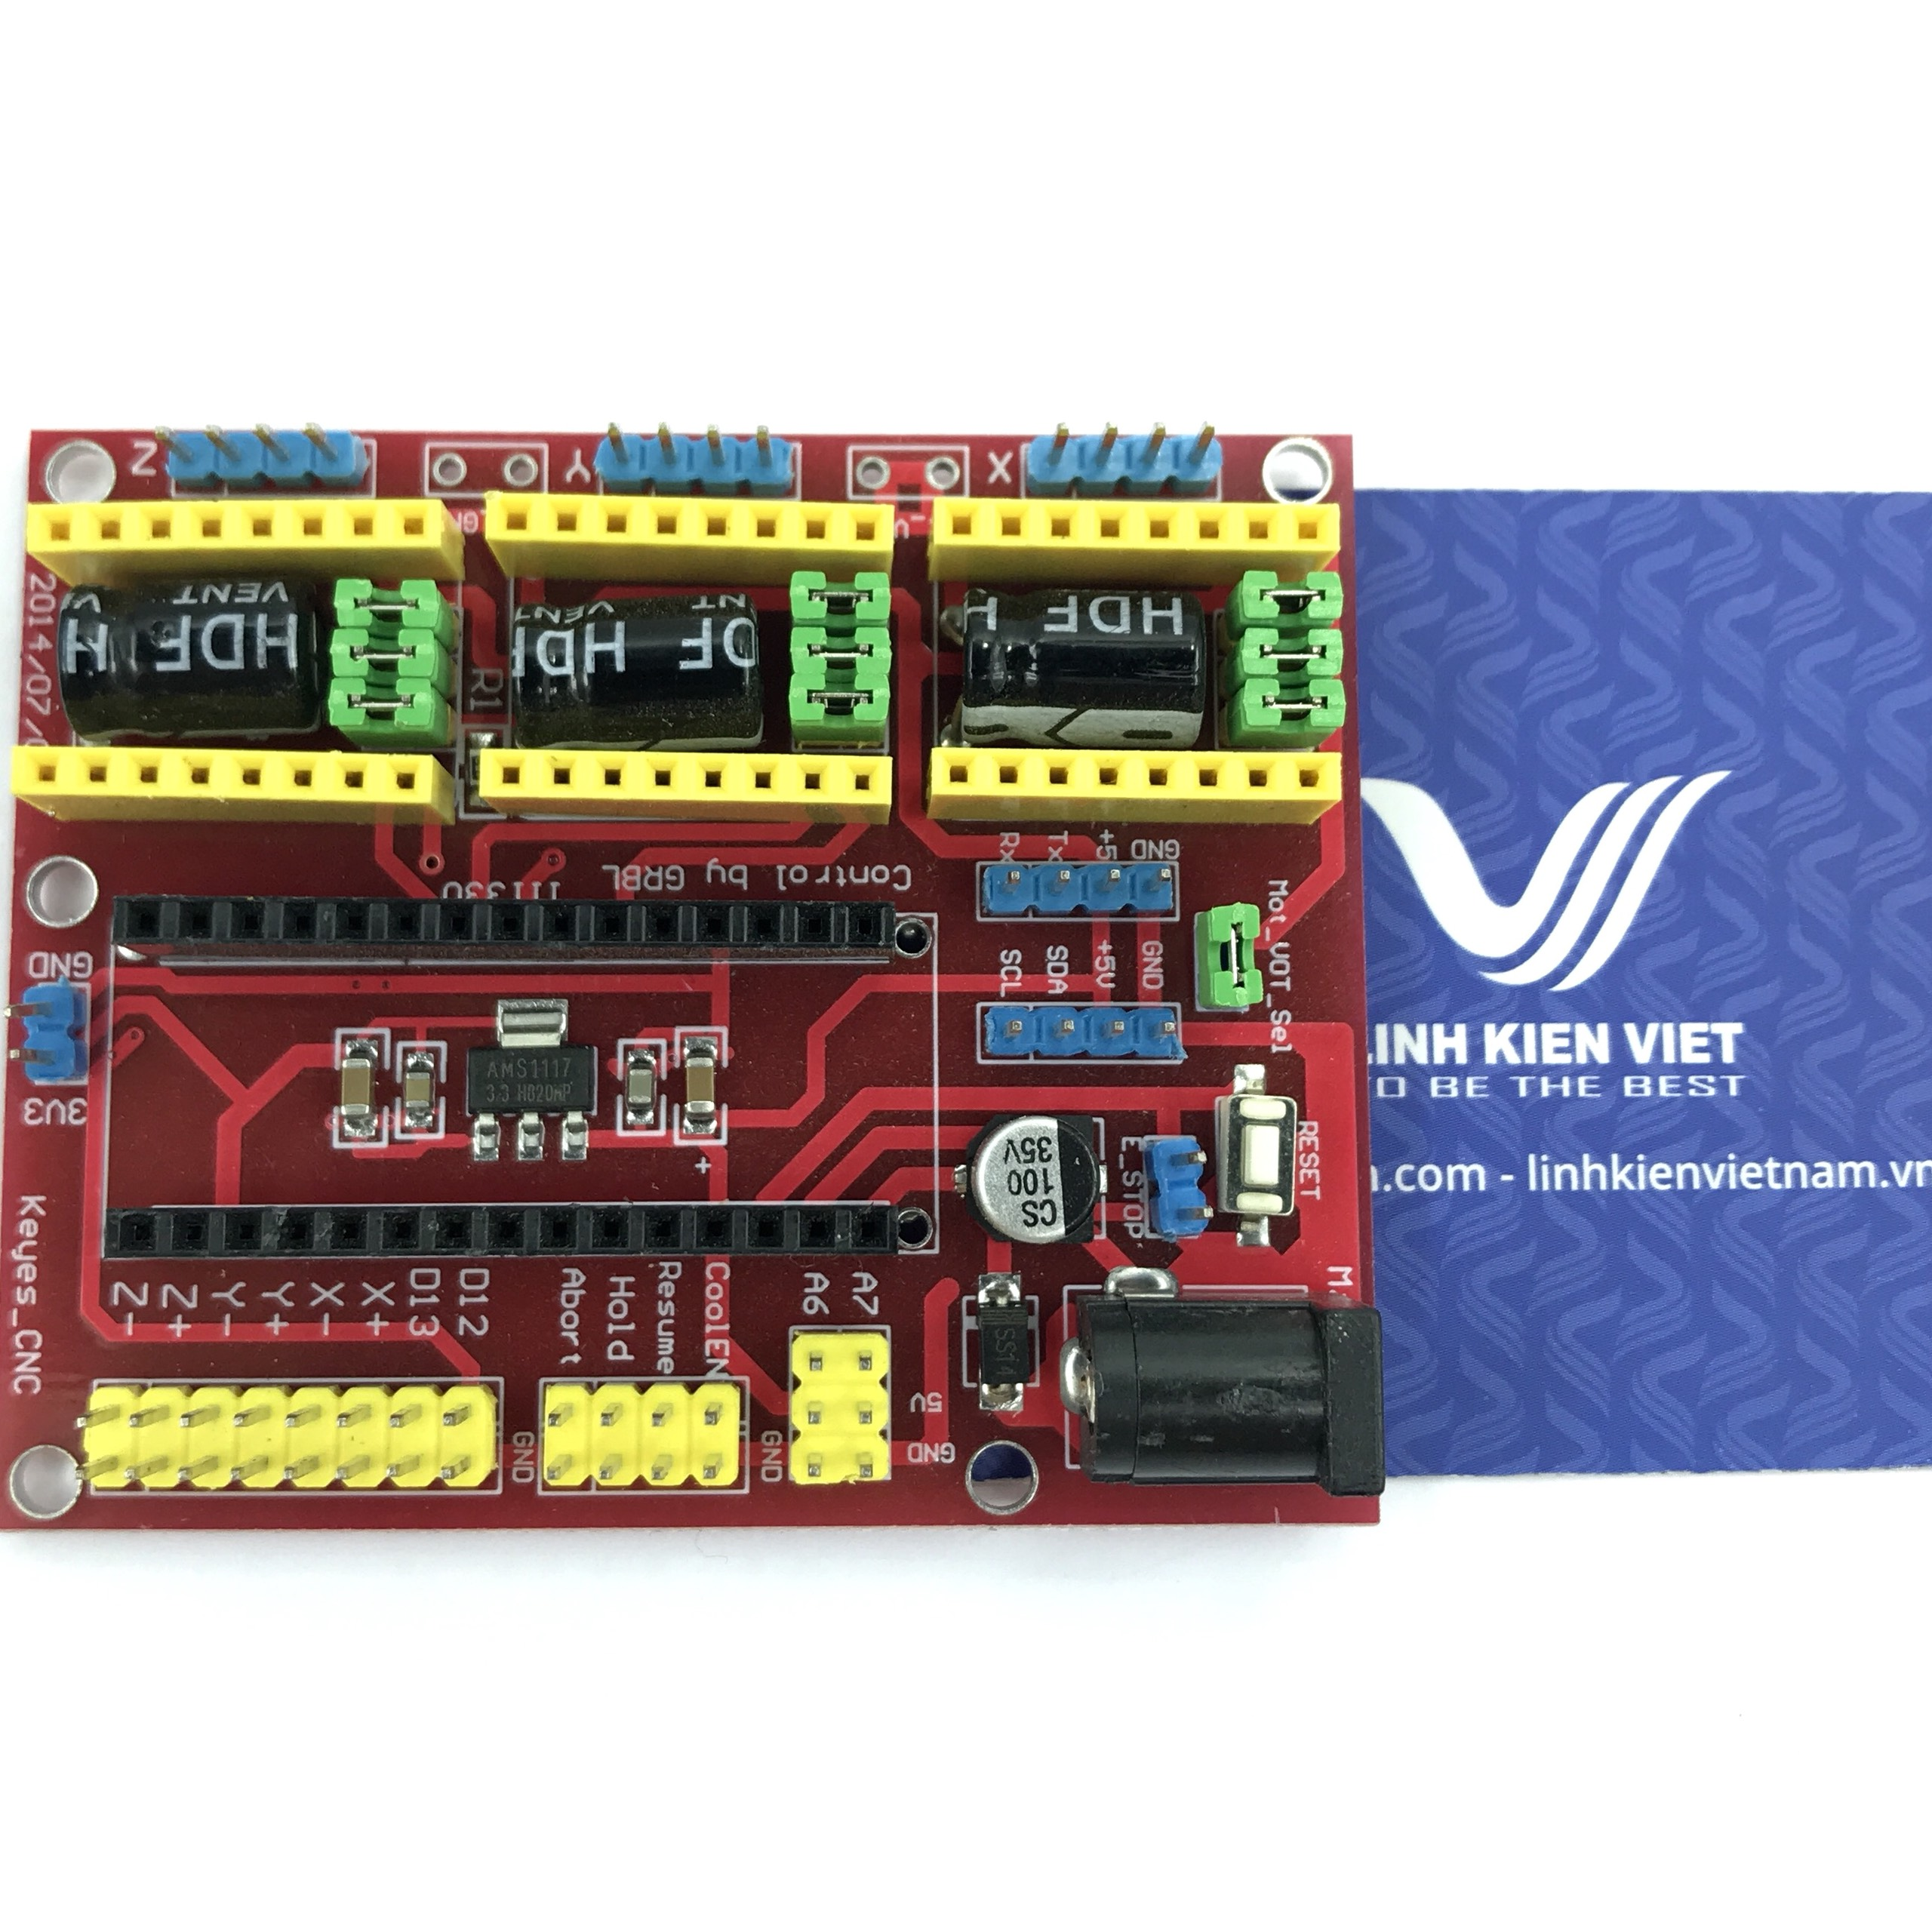 Arduino CNC Shield A4988 V4 - D3H23